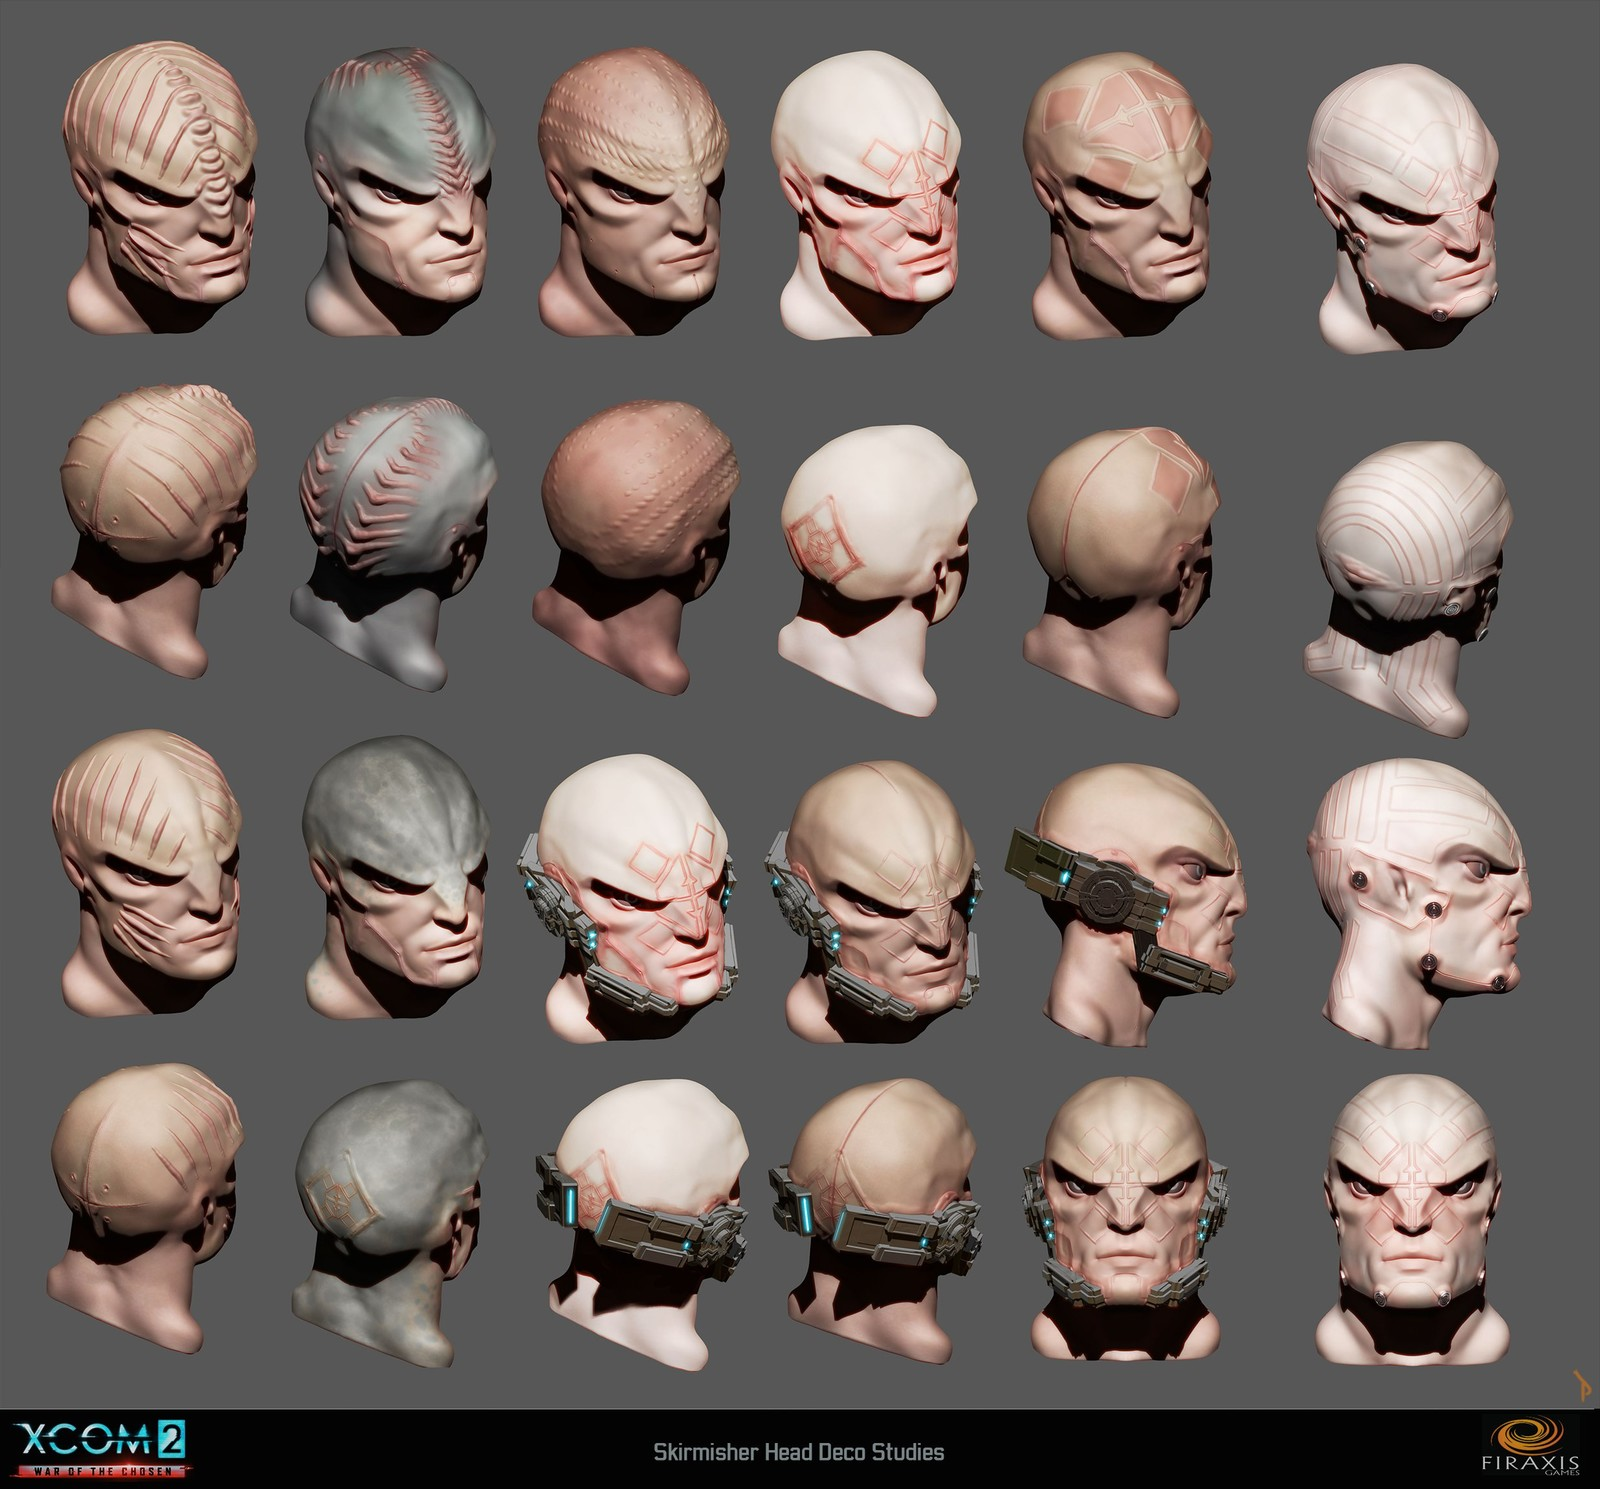 Skirmisher head deco variations